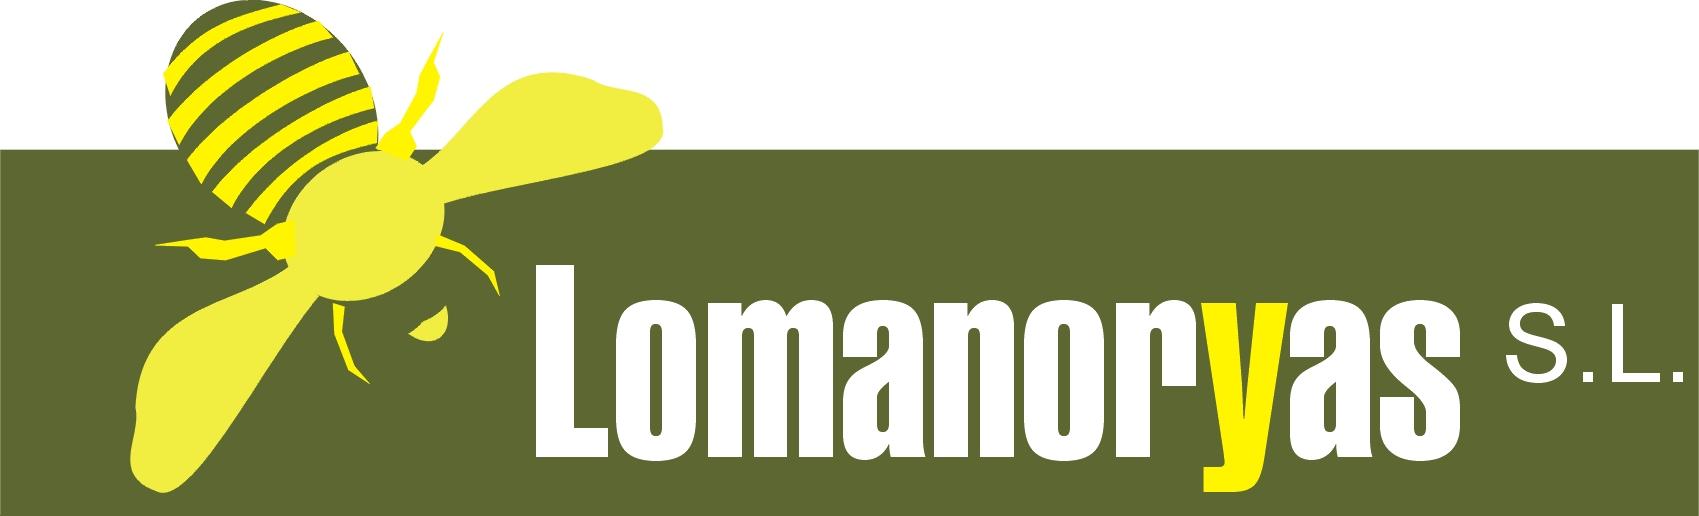 Lomanoryas